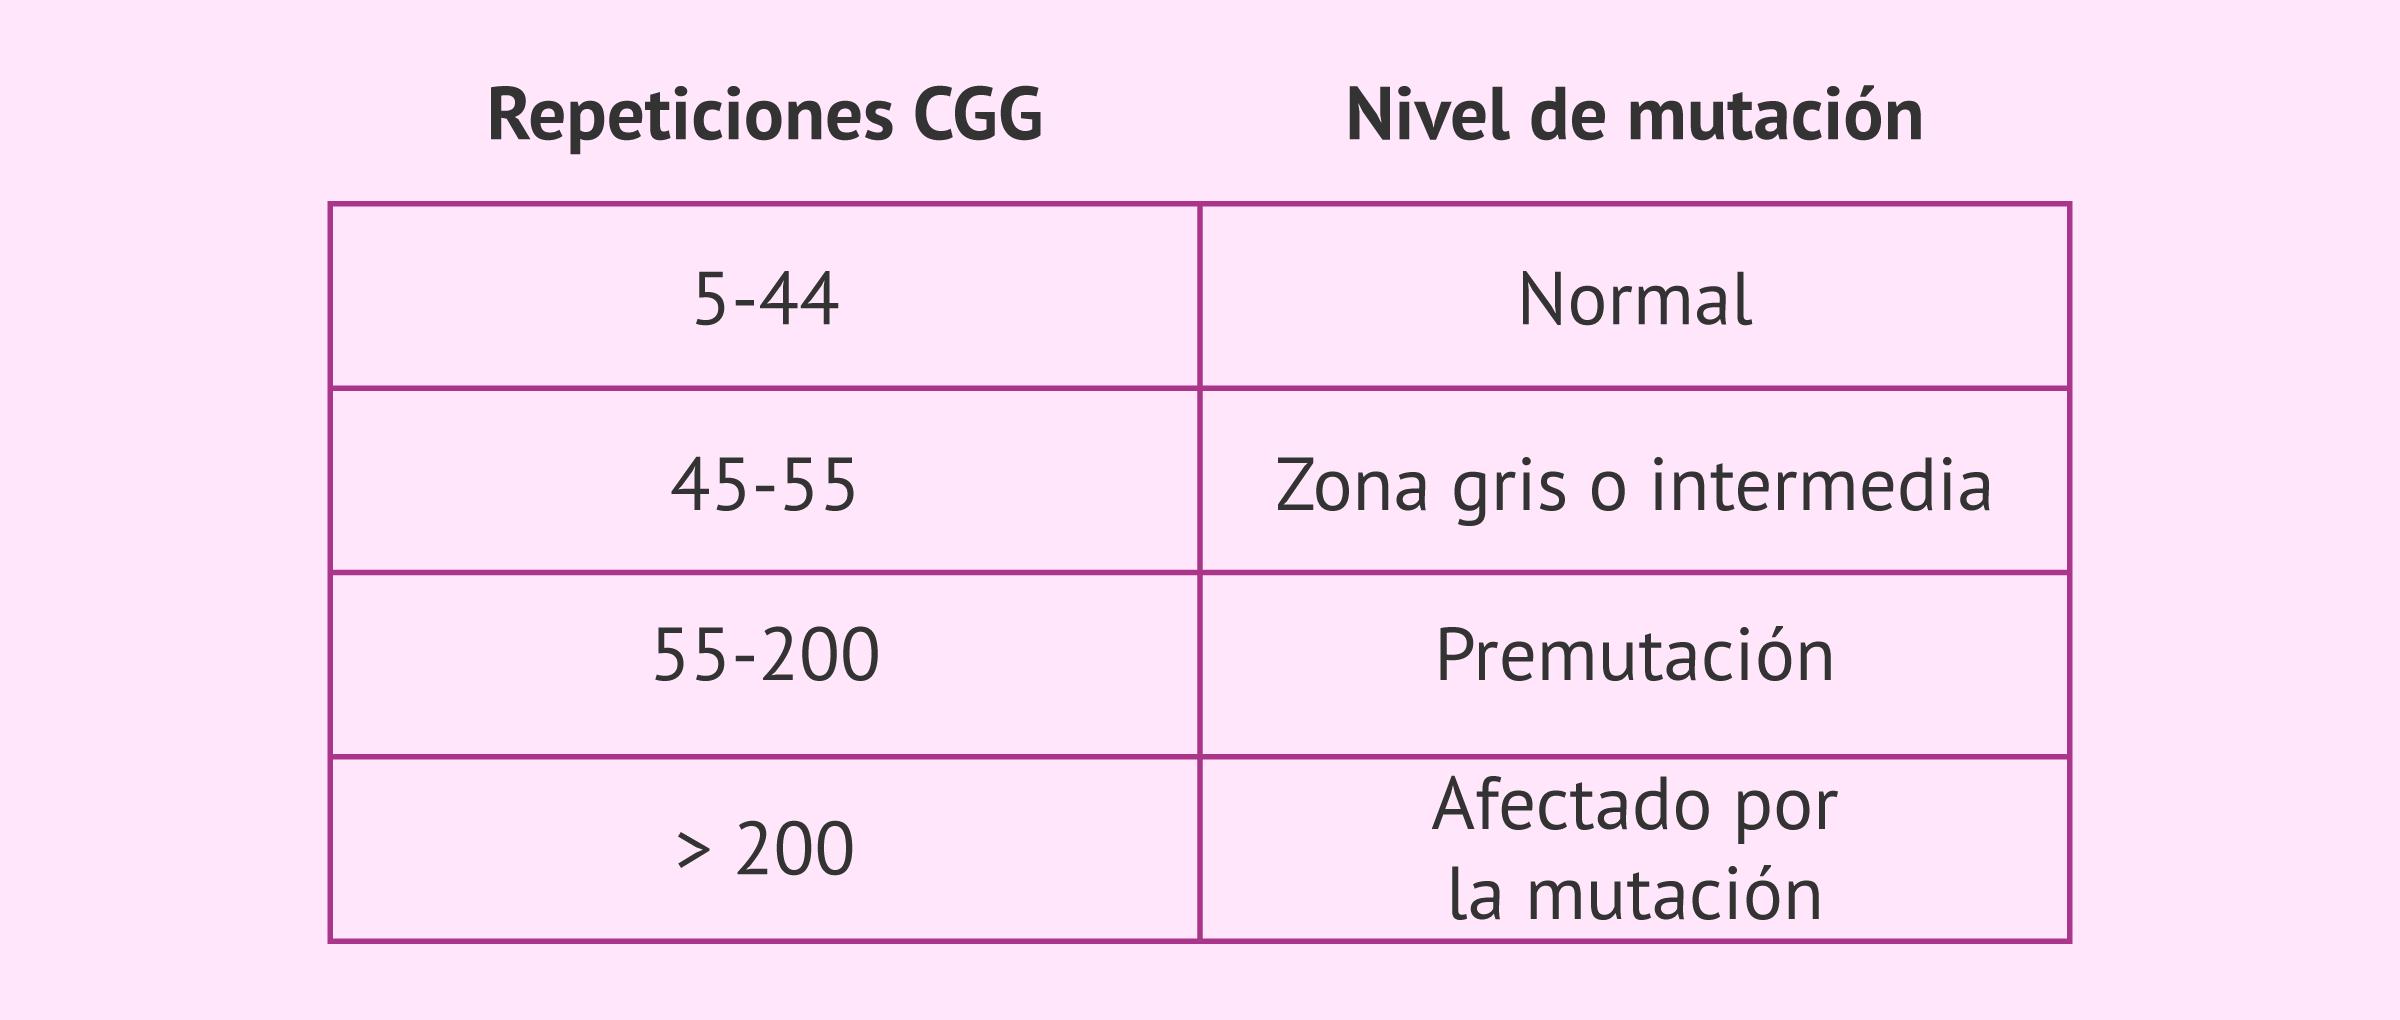 Niveles de mutación para el Síndrome de X Frágil